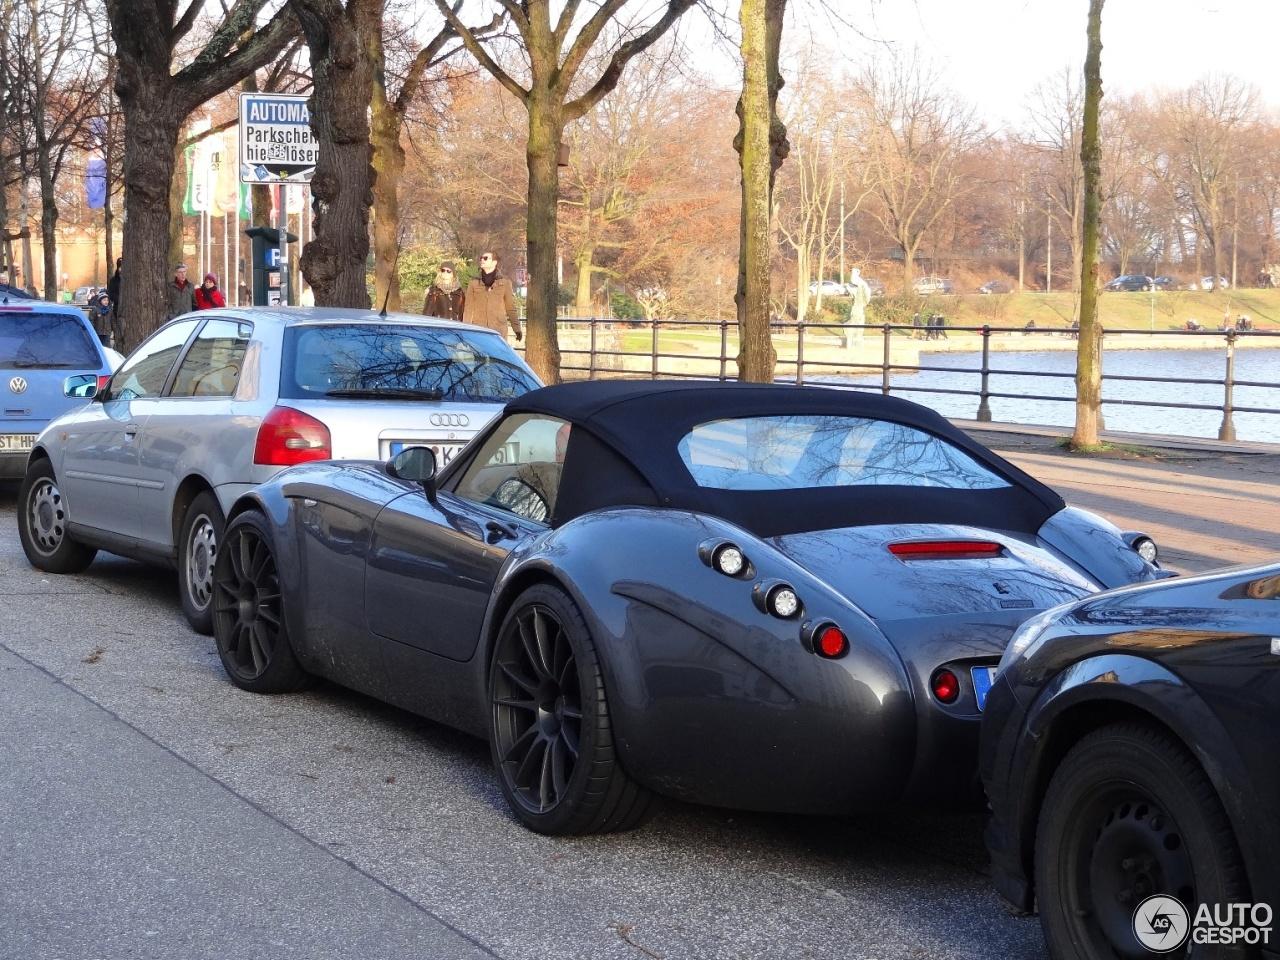 Wiesmann Roadster MF4 - 15 December 2014 - Autogespot